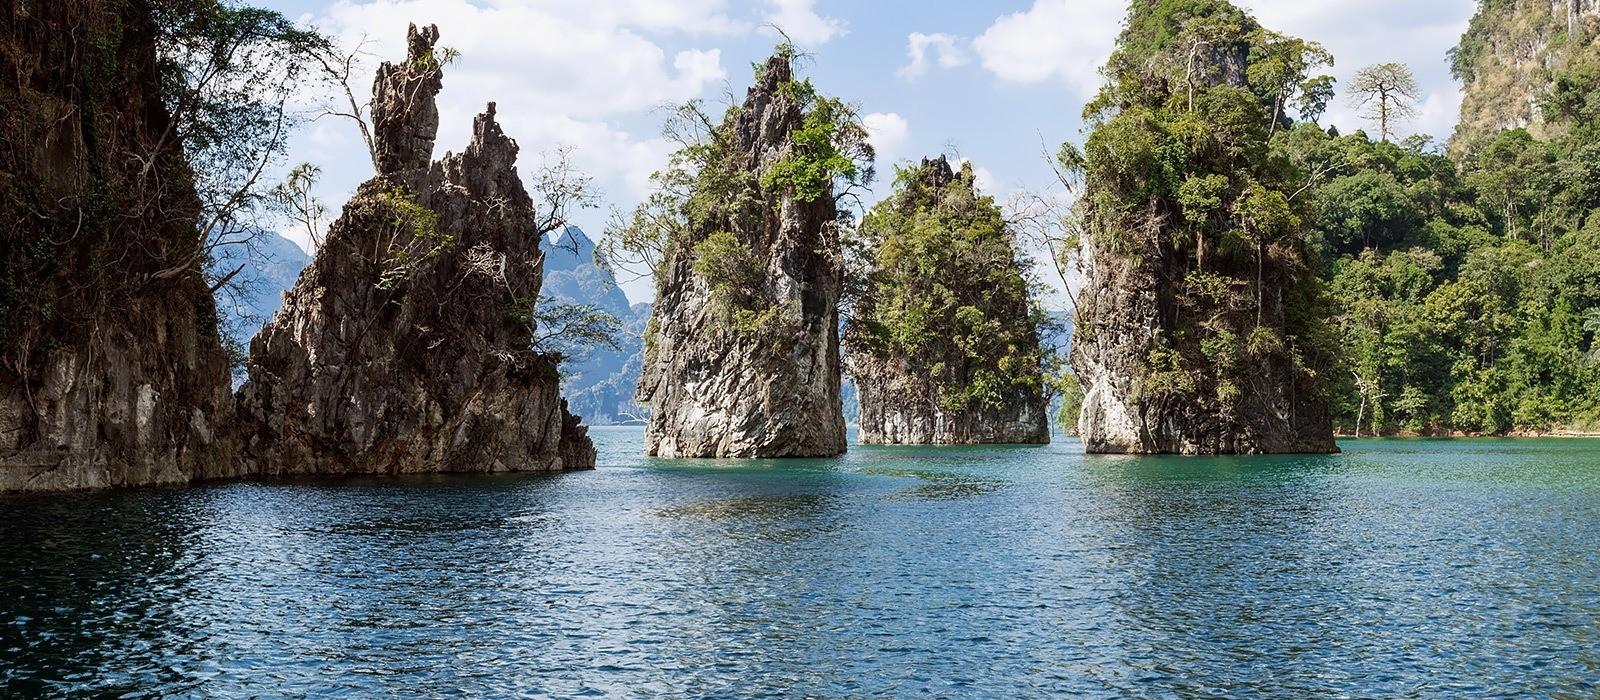 Top 10 Wildlife Reserves in the world, khao sok wildlife reserves